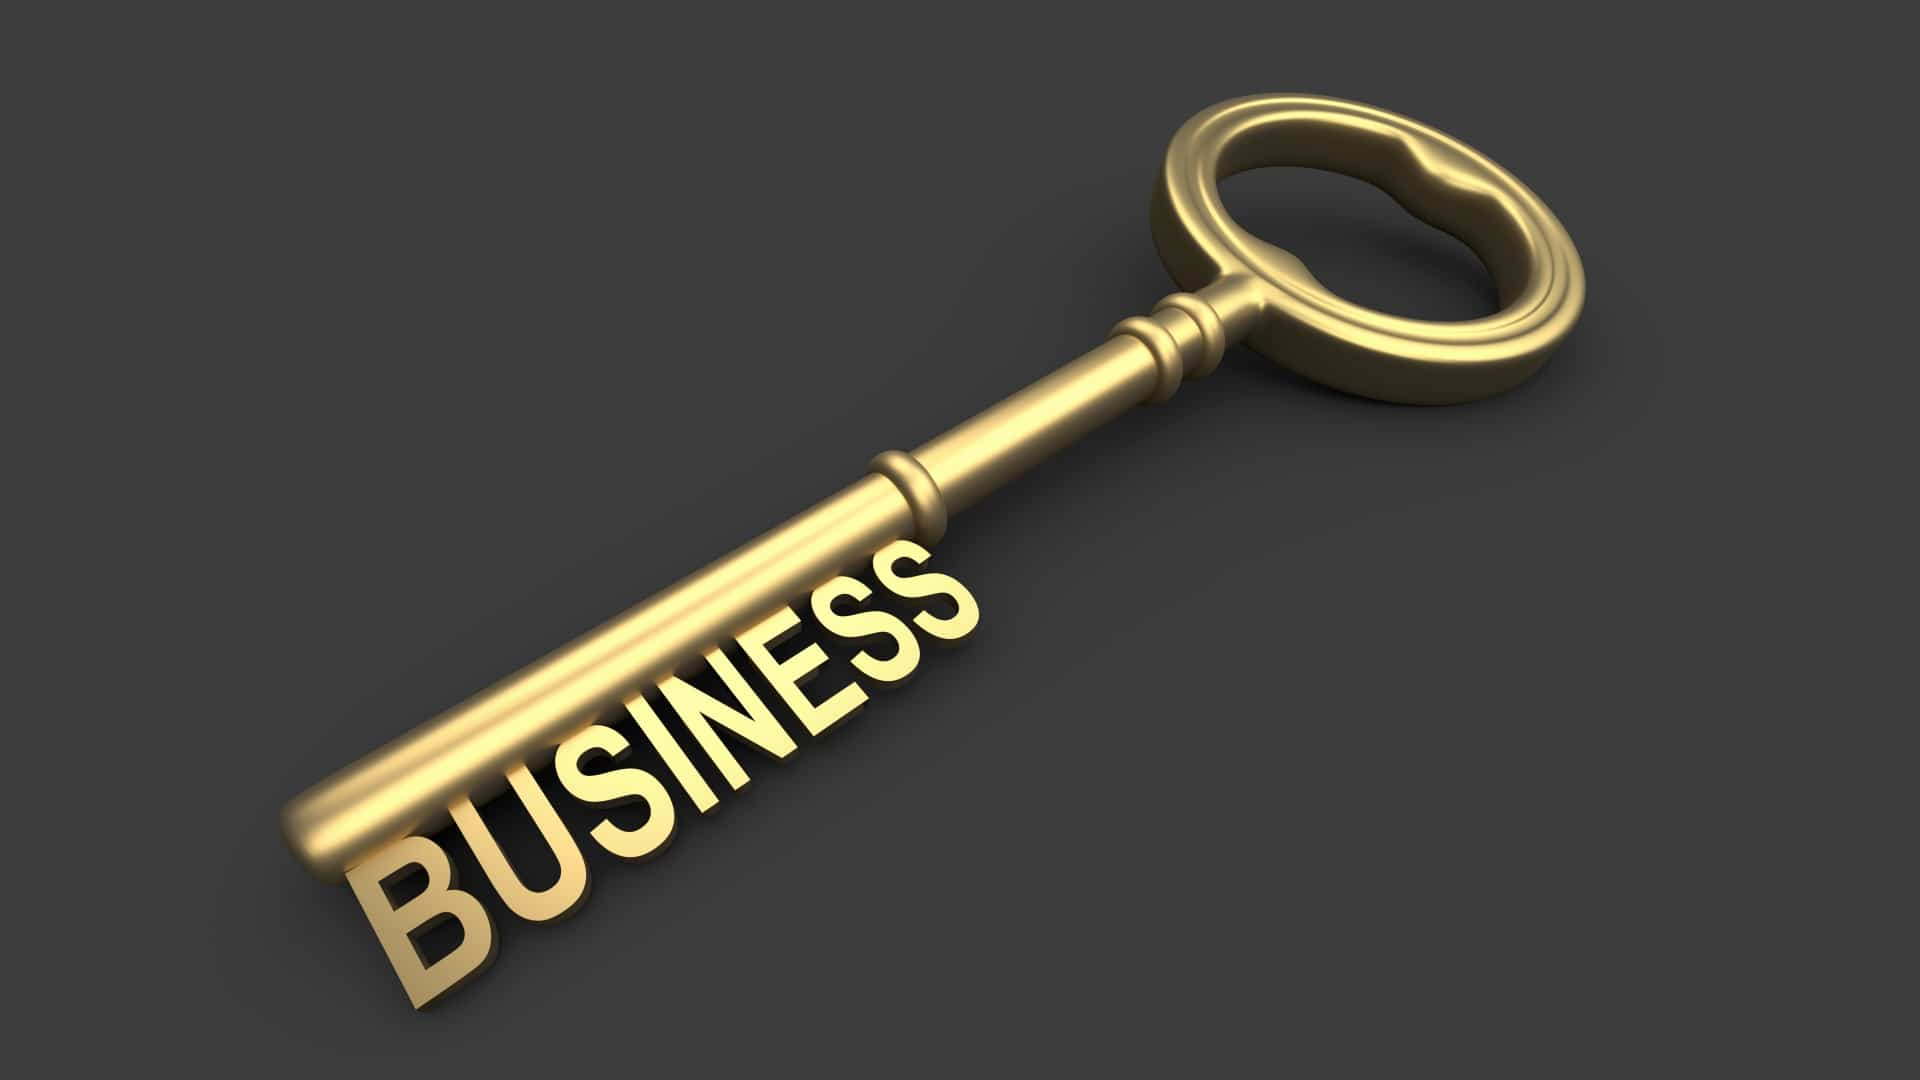 IMAC conseils & management